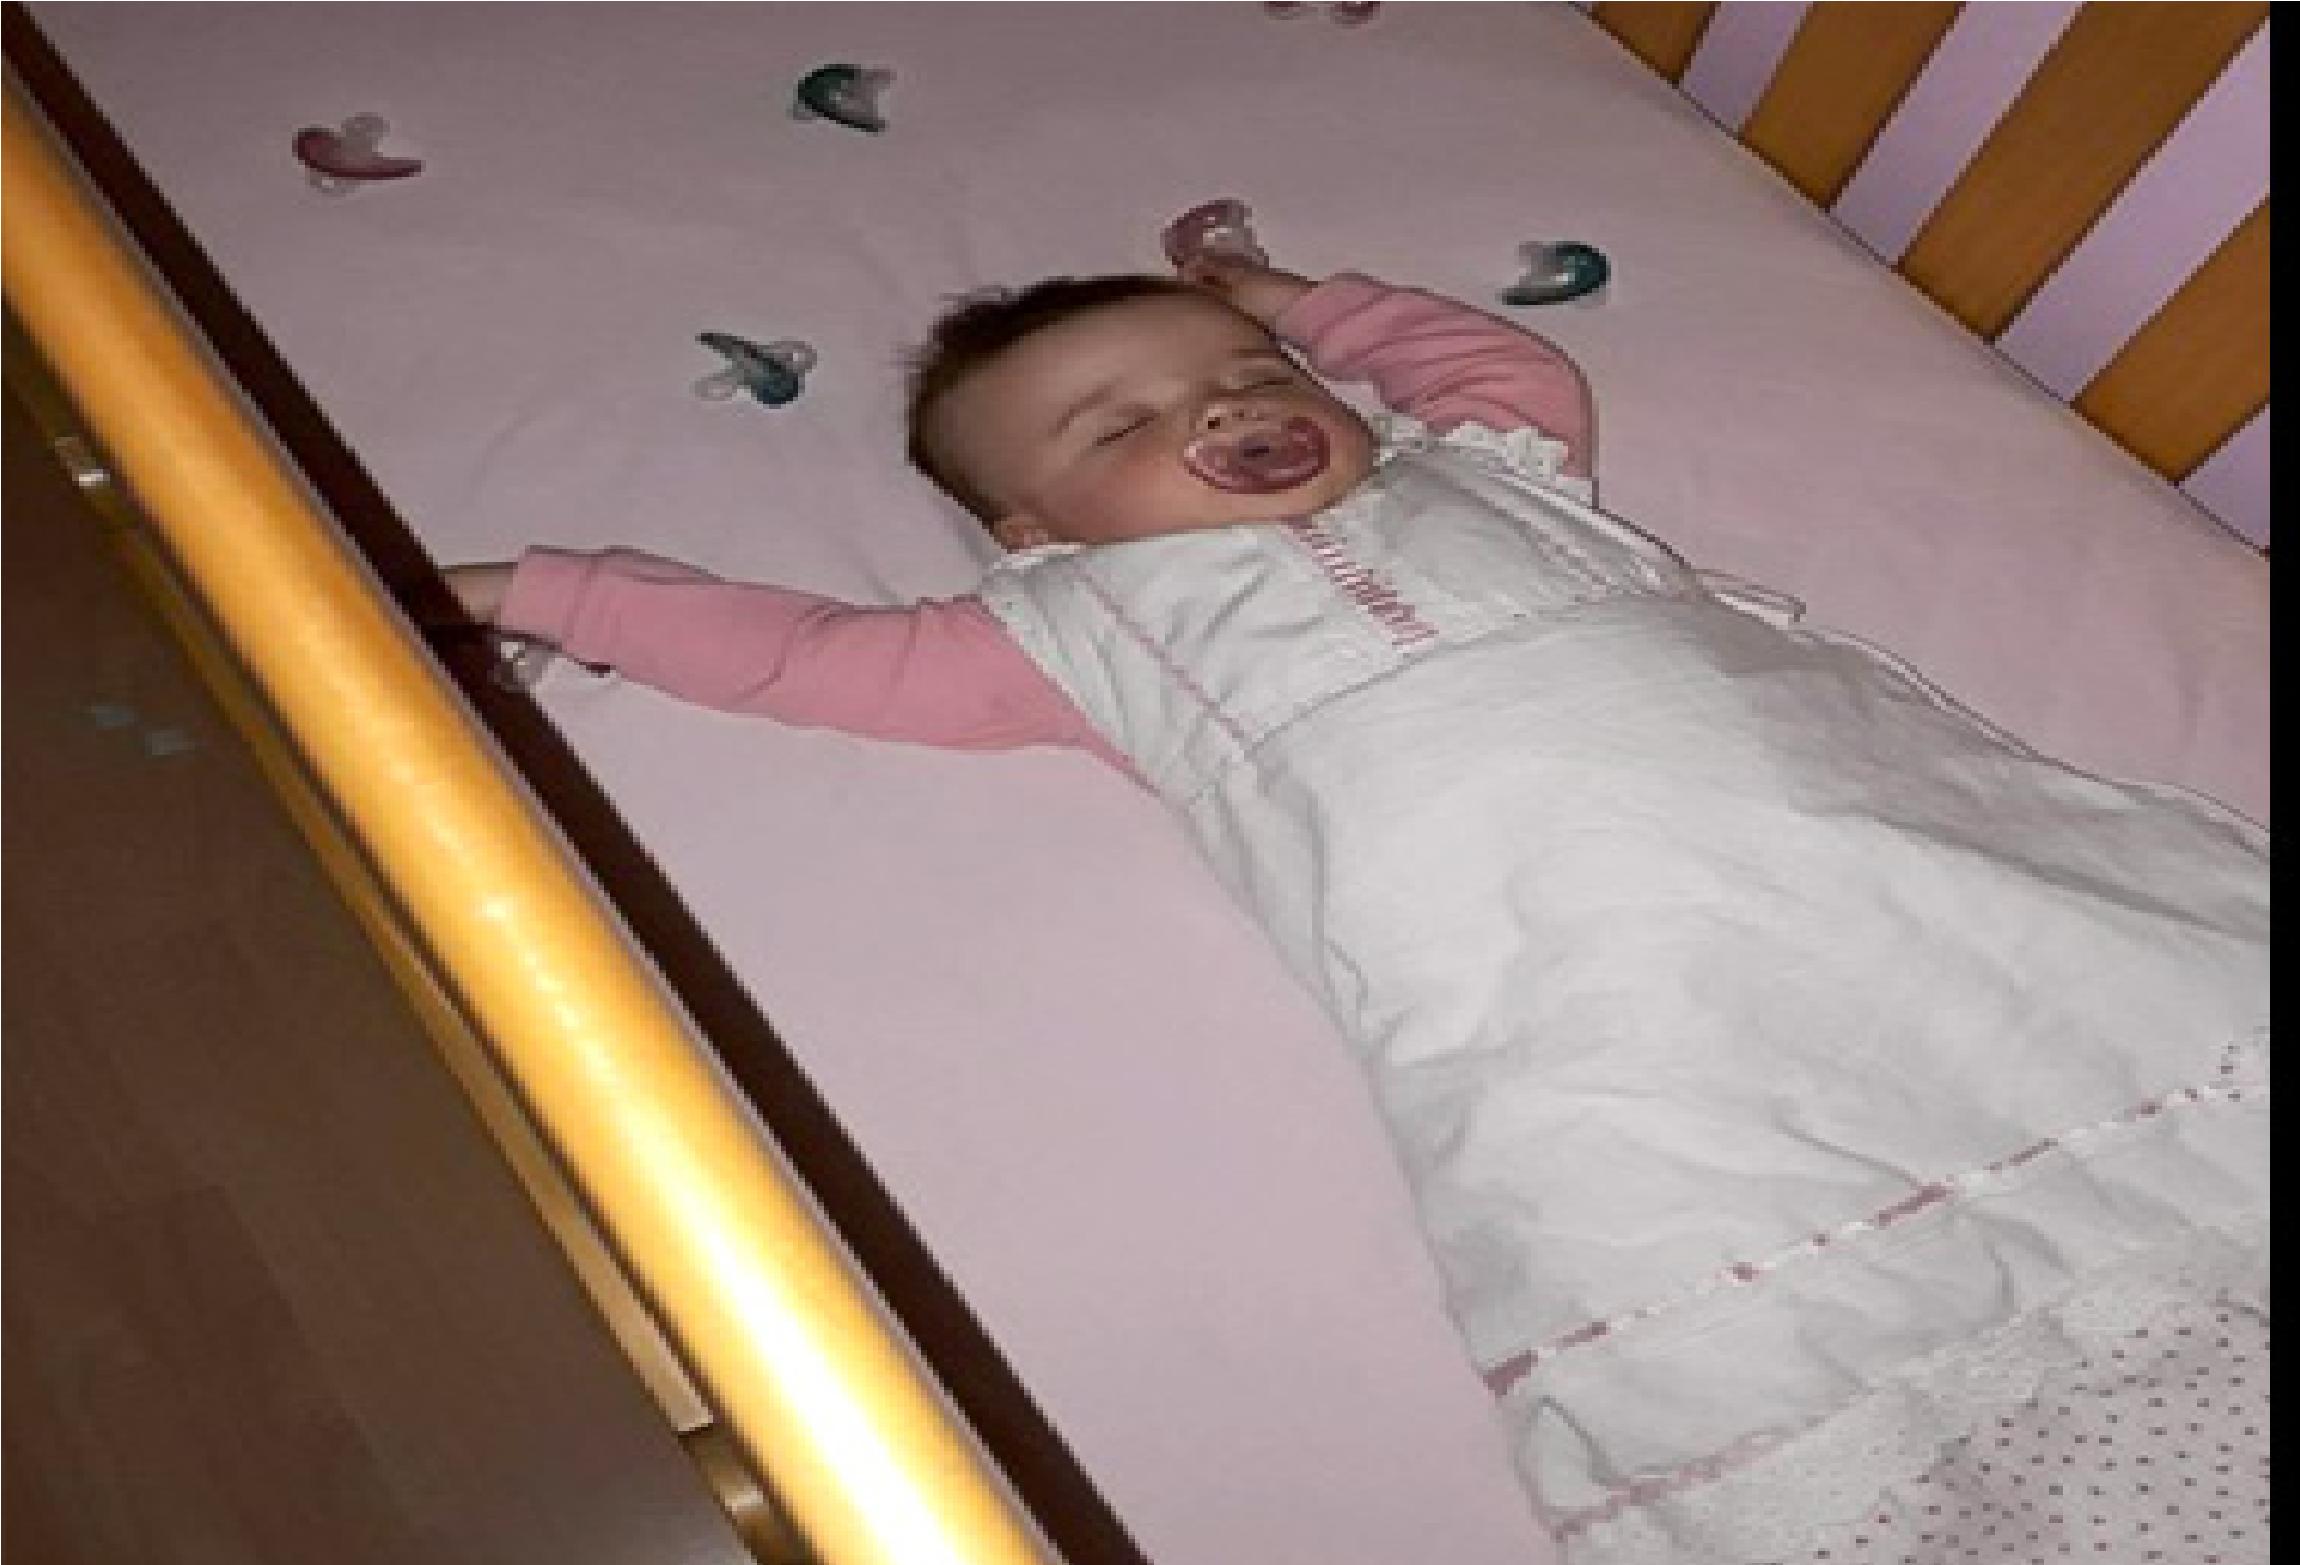 To πανέξυπνο κόλπο αυτής της μαμάς για να σταματήσει το κλάμα του μωρού της έγινε viral!